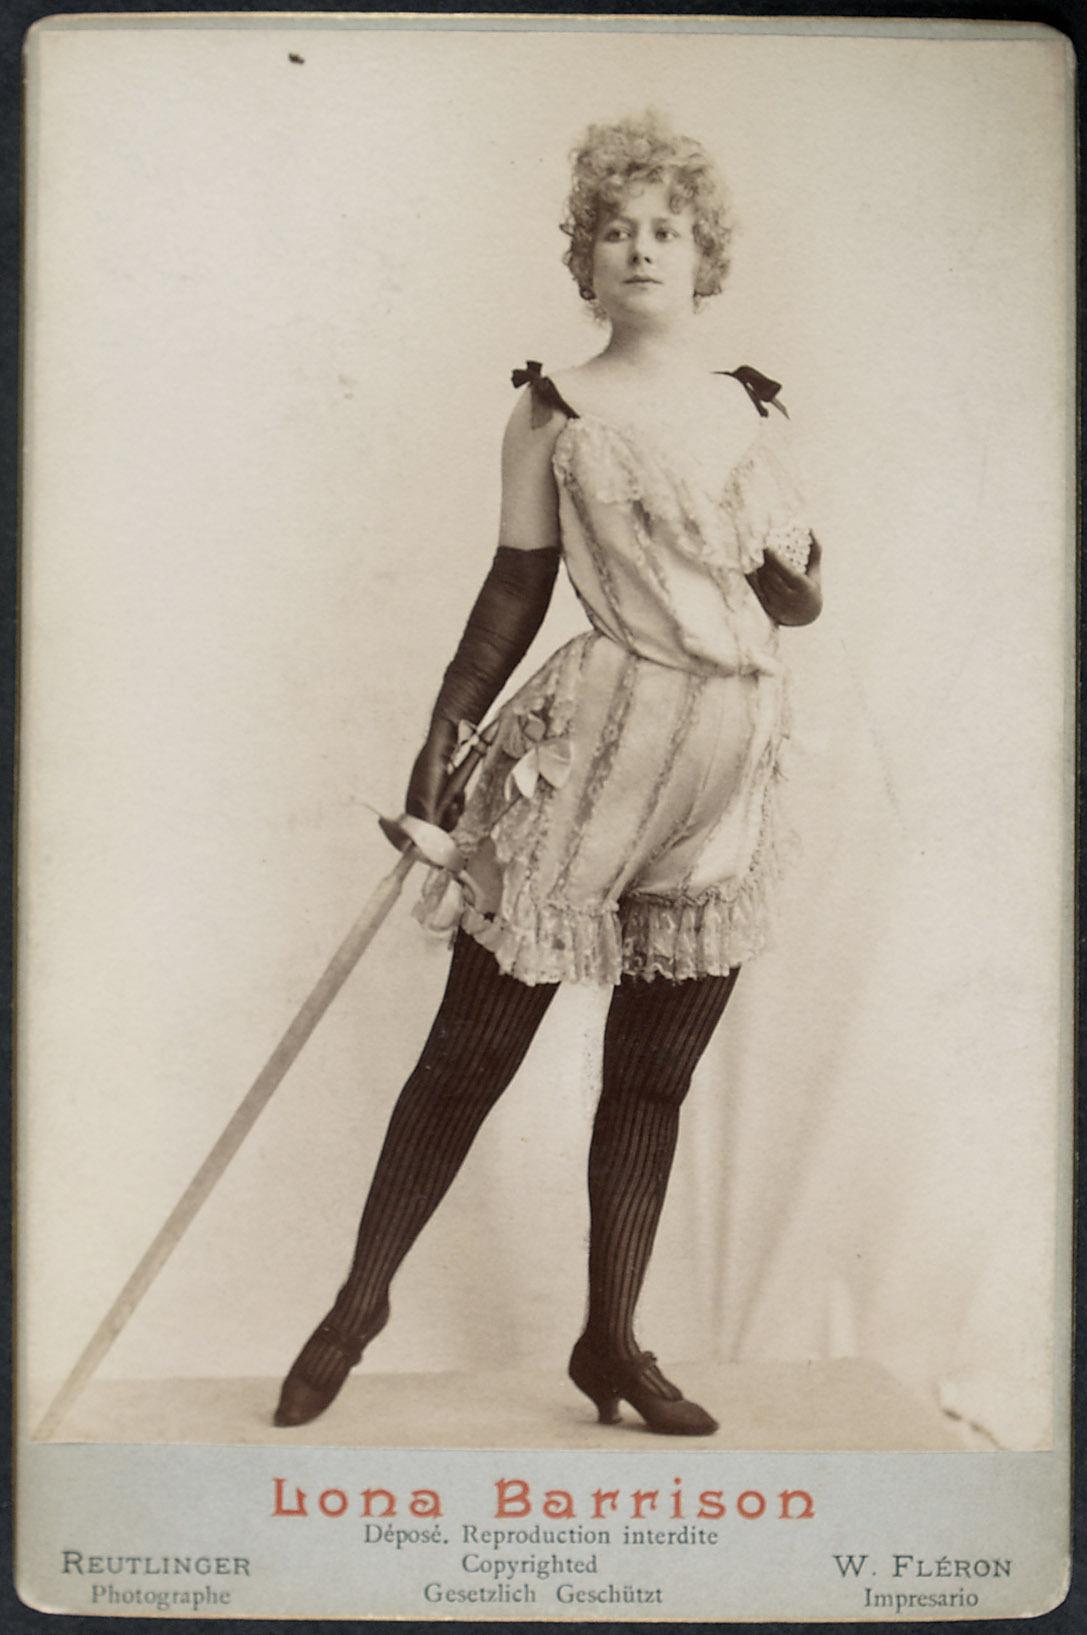 Lona Barrison von Reutlinger, Paris